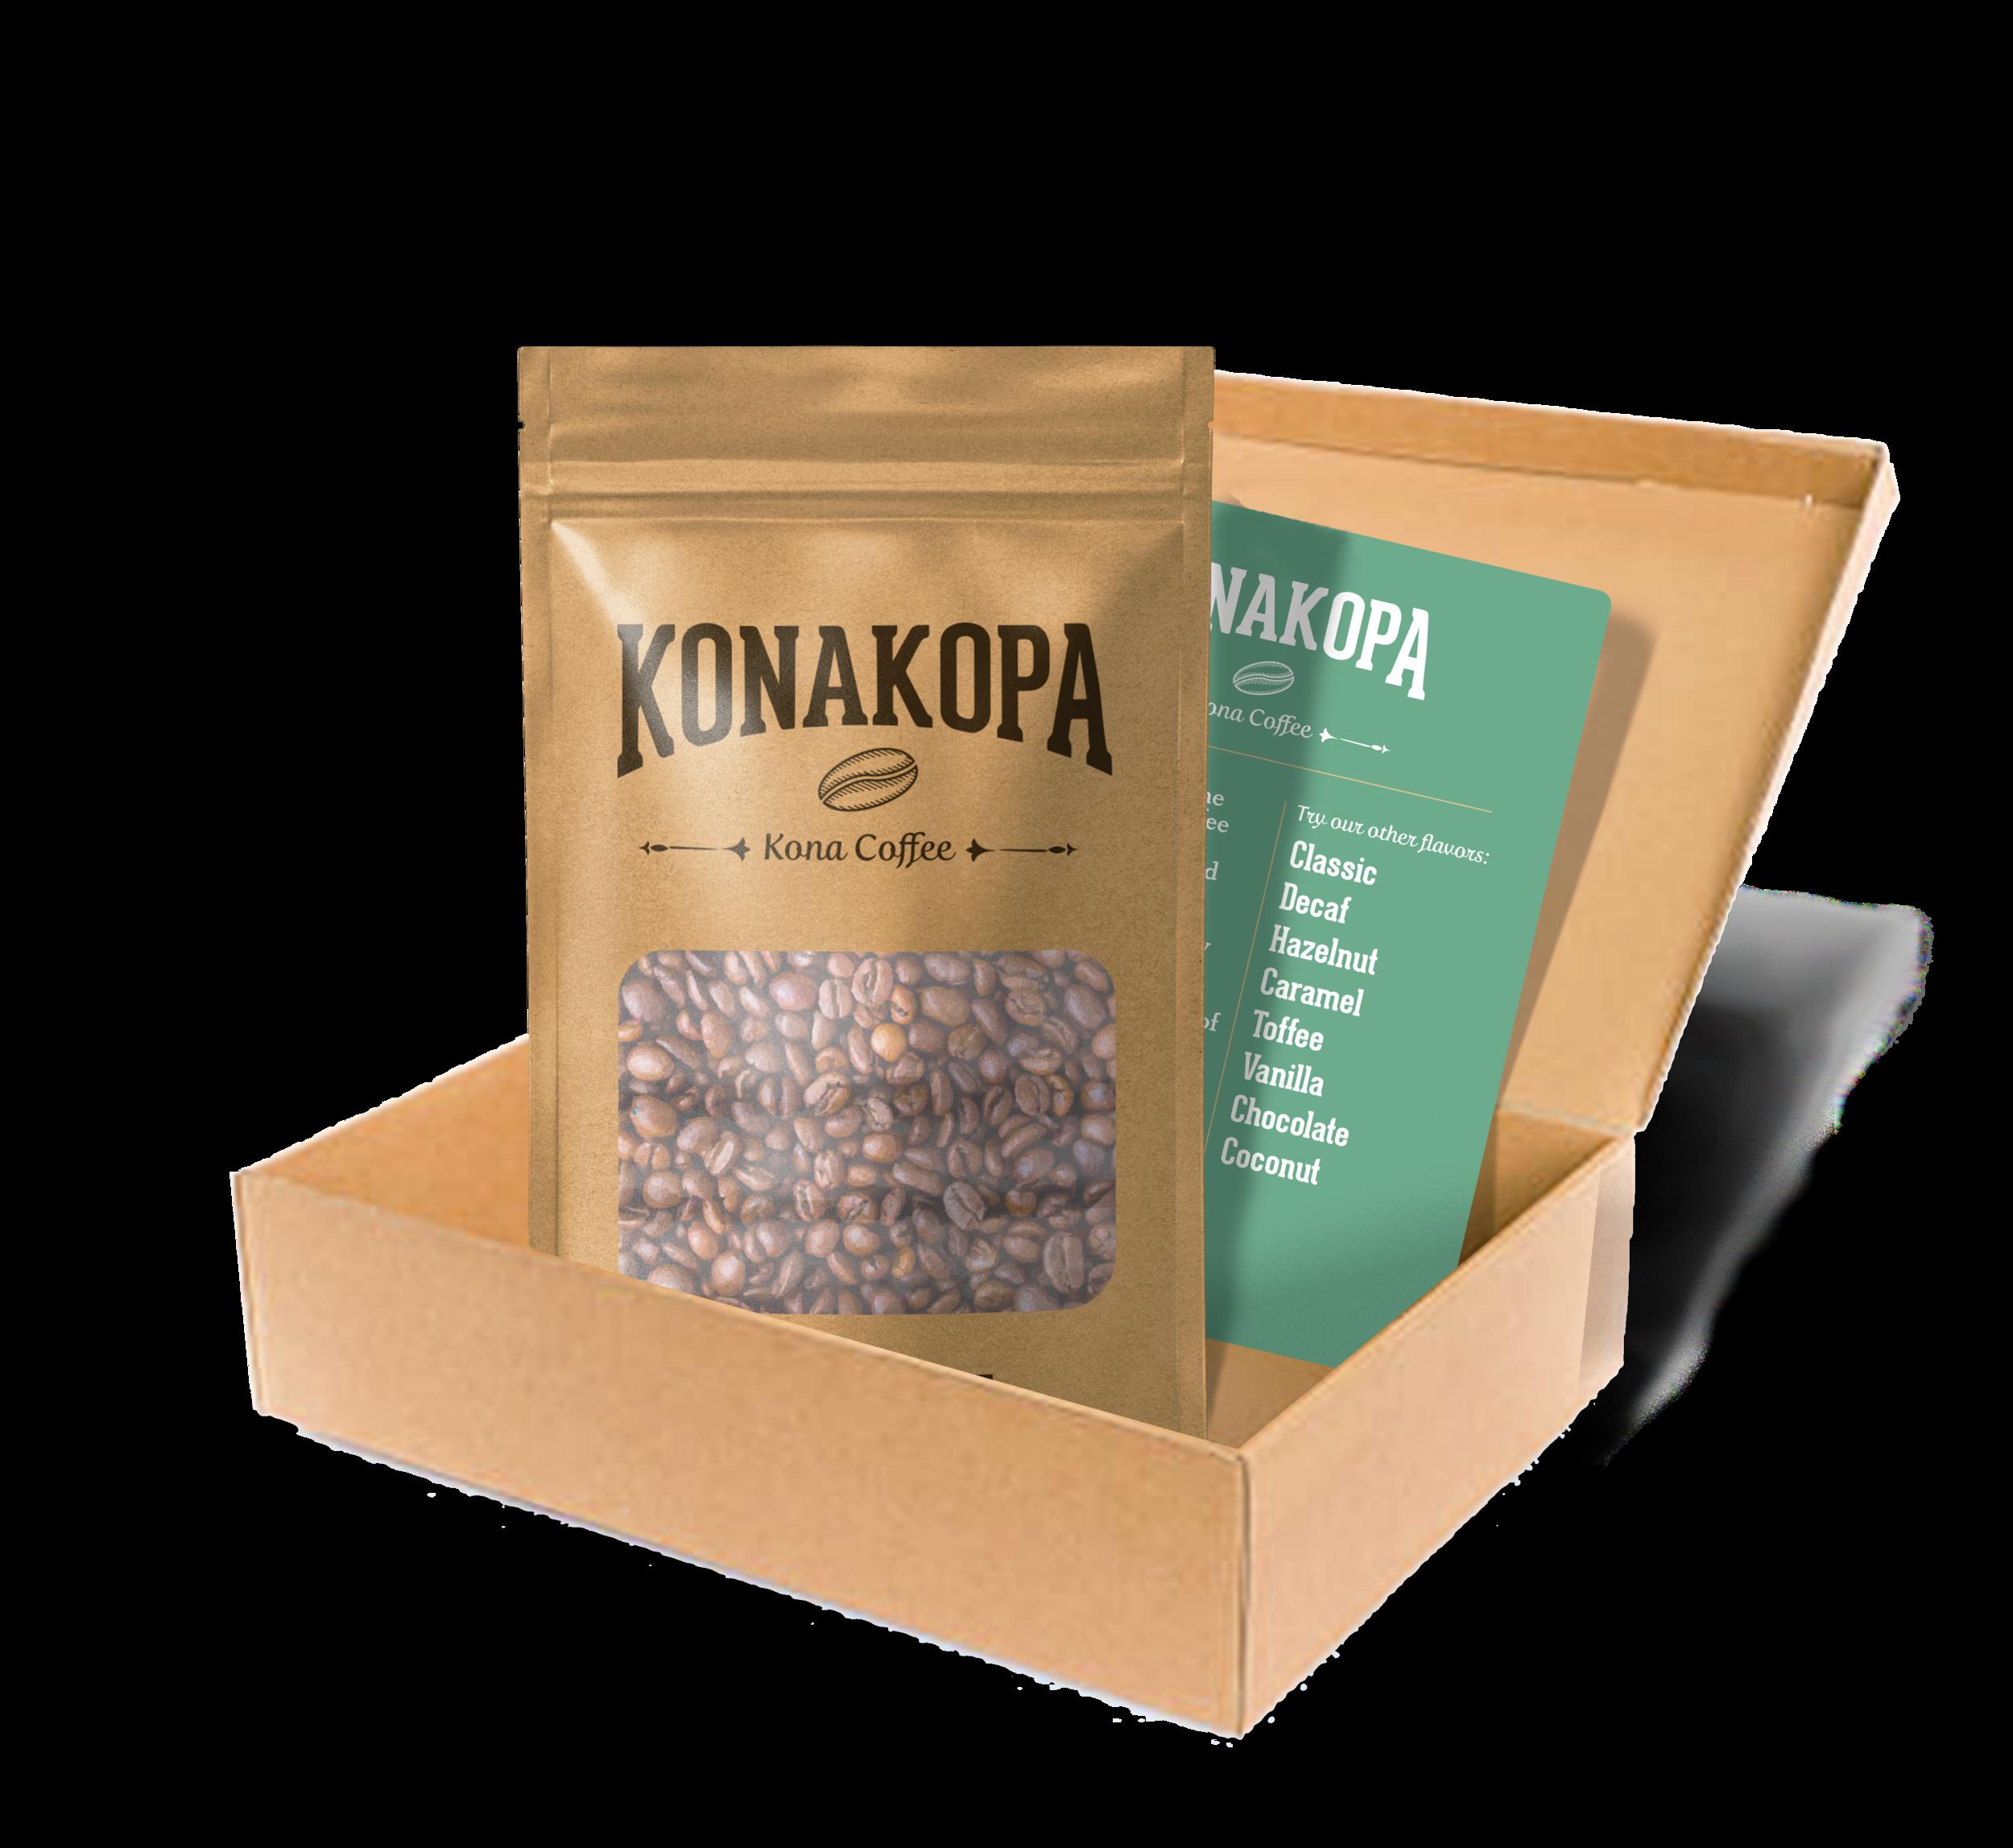 konakopa package mockup copy.png